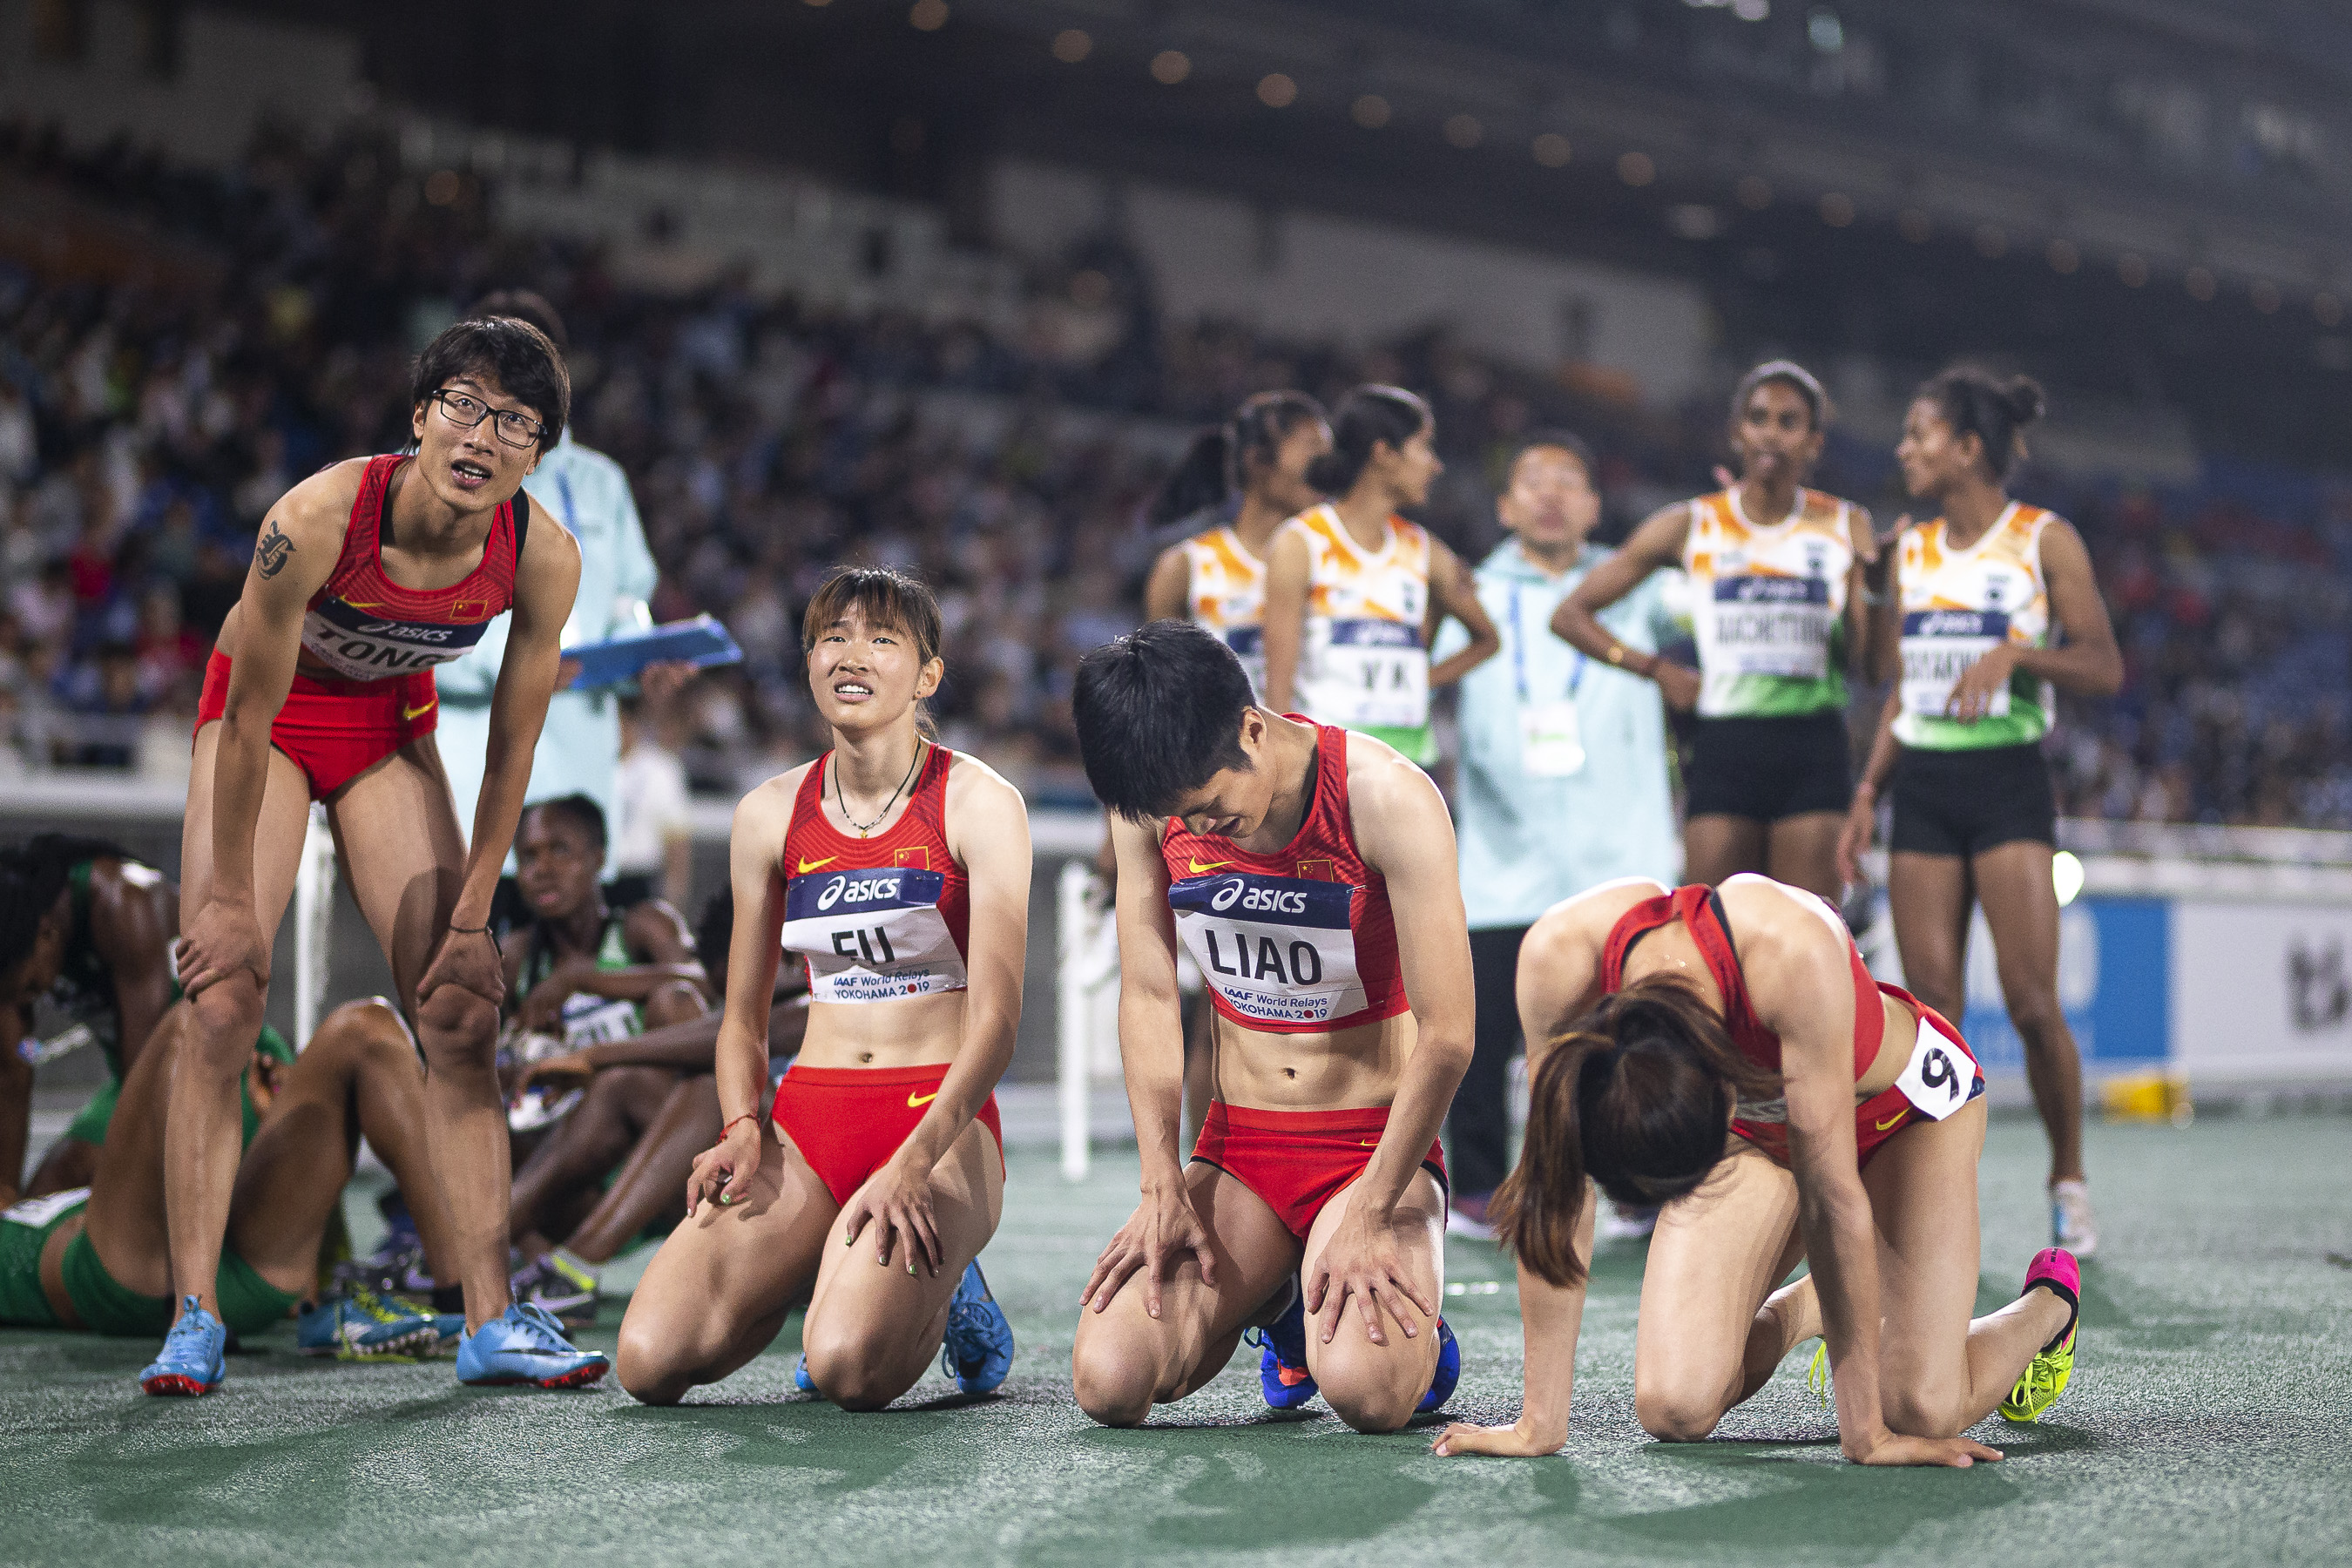 Portfolio(20190511 – Dirk Reps – Leichtathletik World Relays Yokohama – 520)